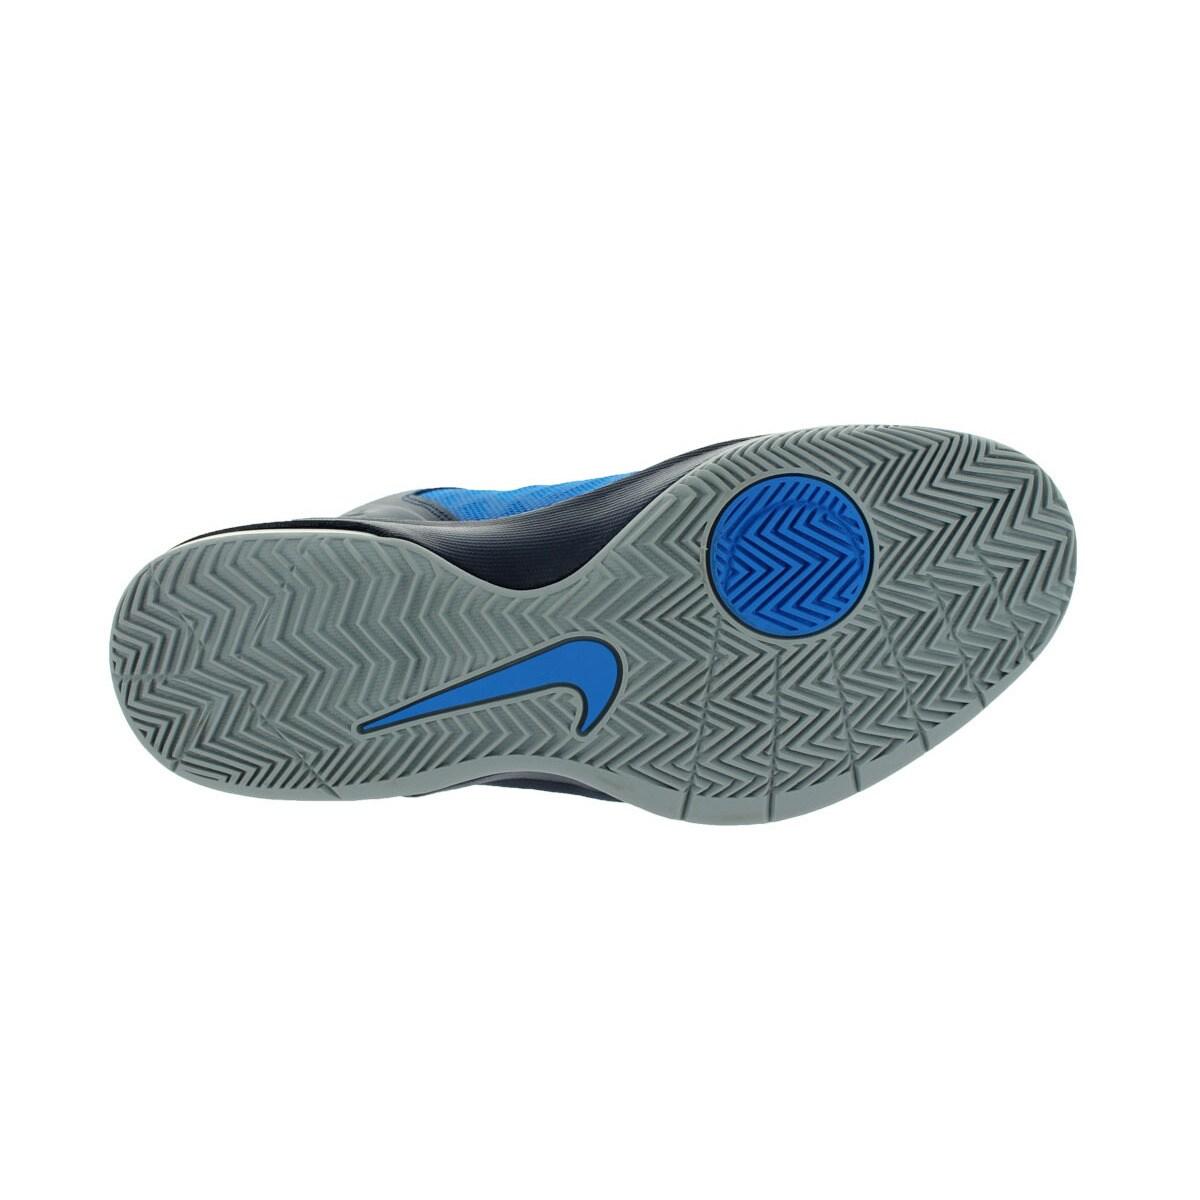 ff872baa6491 ... store shop nike mens air max body u mid height navy wolf grey orange  basketball shoe